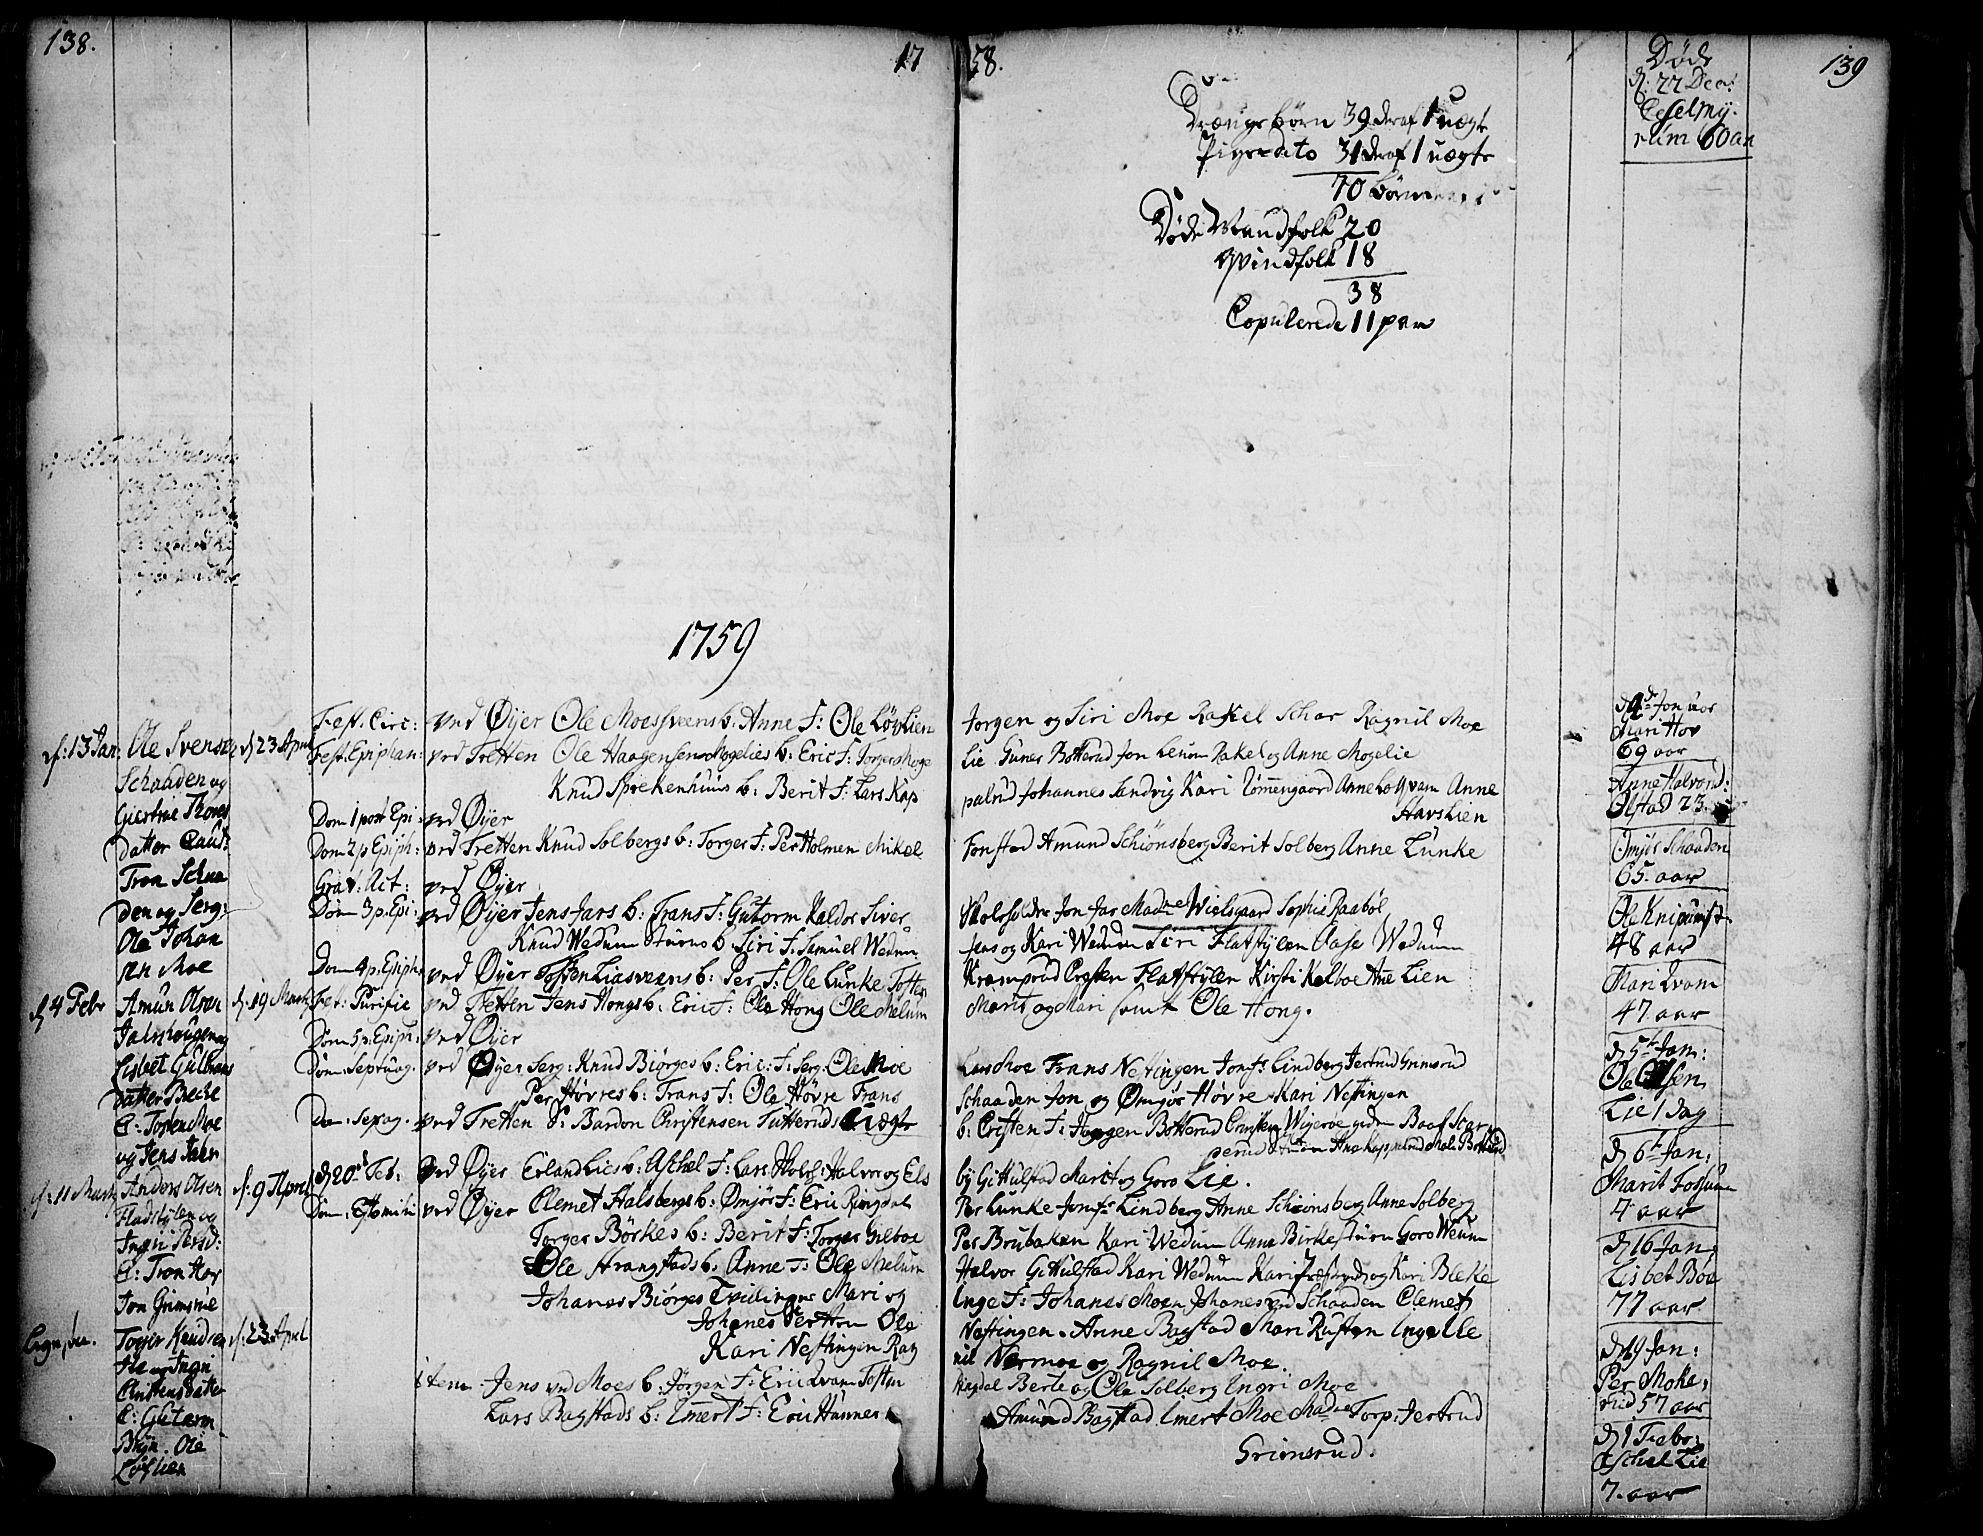 SAH, Øyer prestekontor, Ministerialbok nr. 2, 1733-1784, s. 138-139